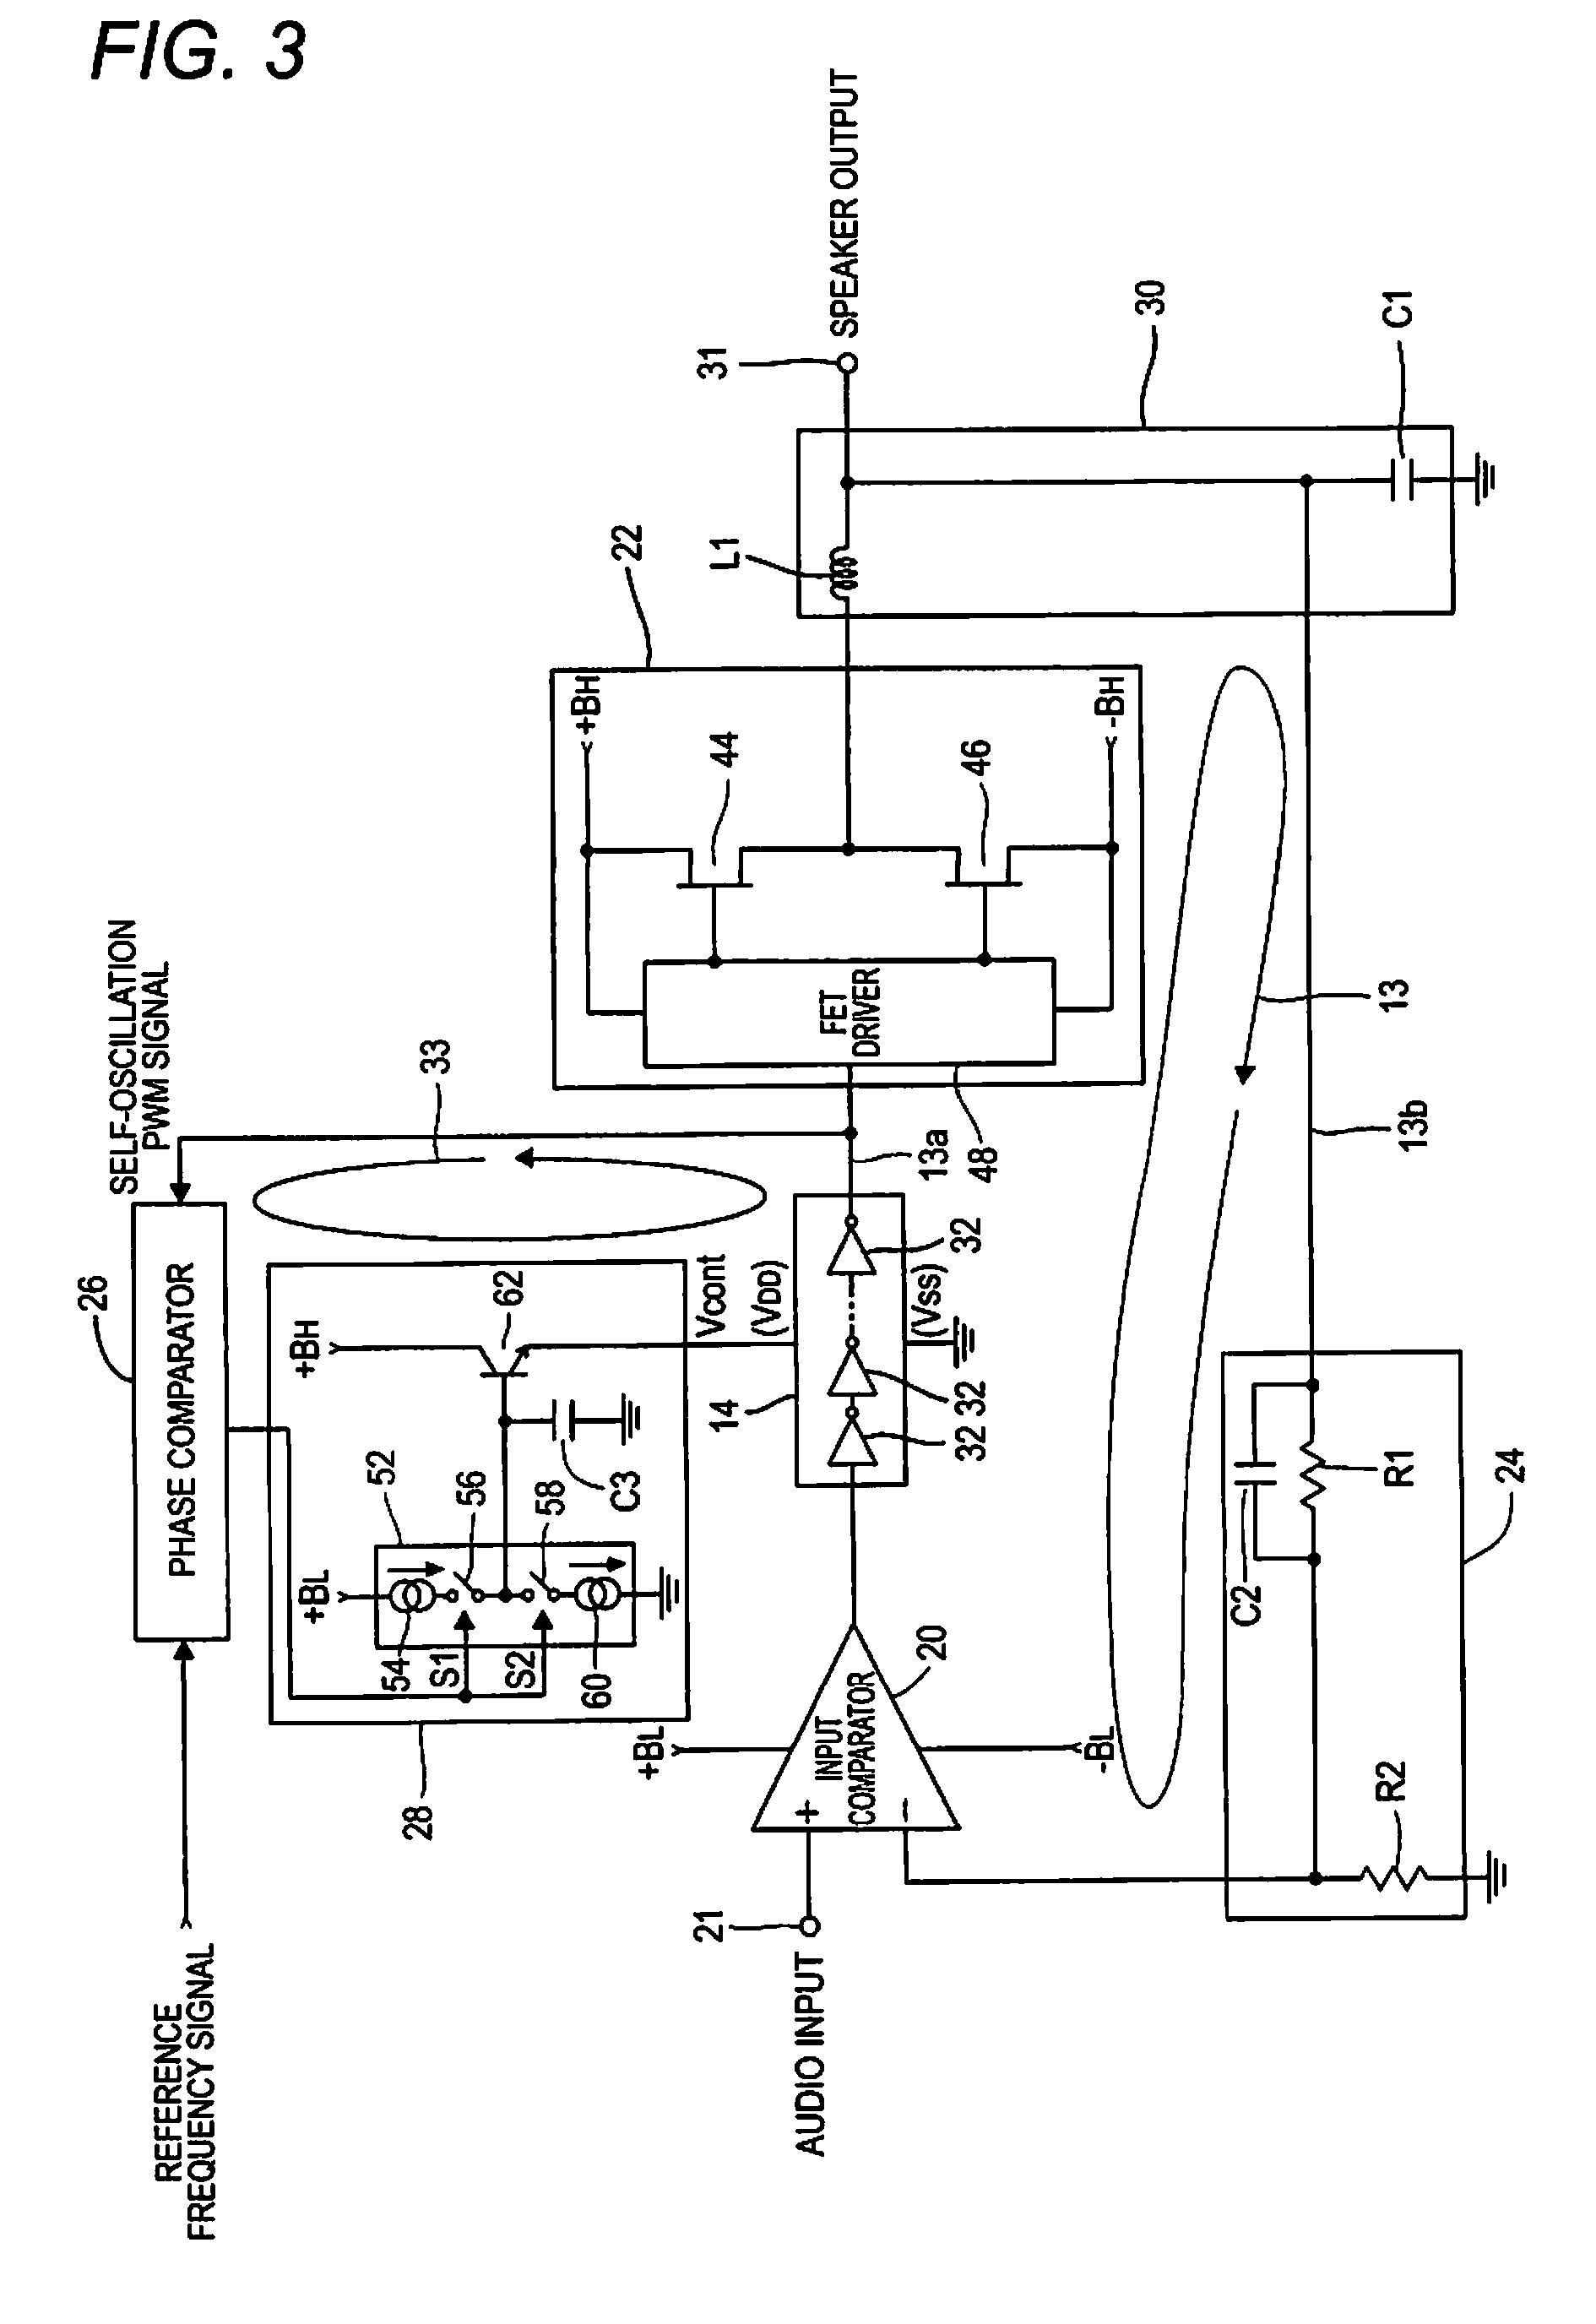 tmc wiper motor wiring diagram